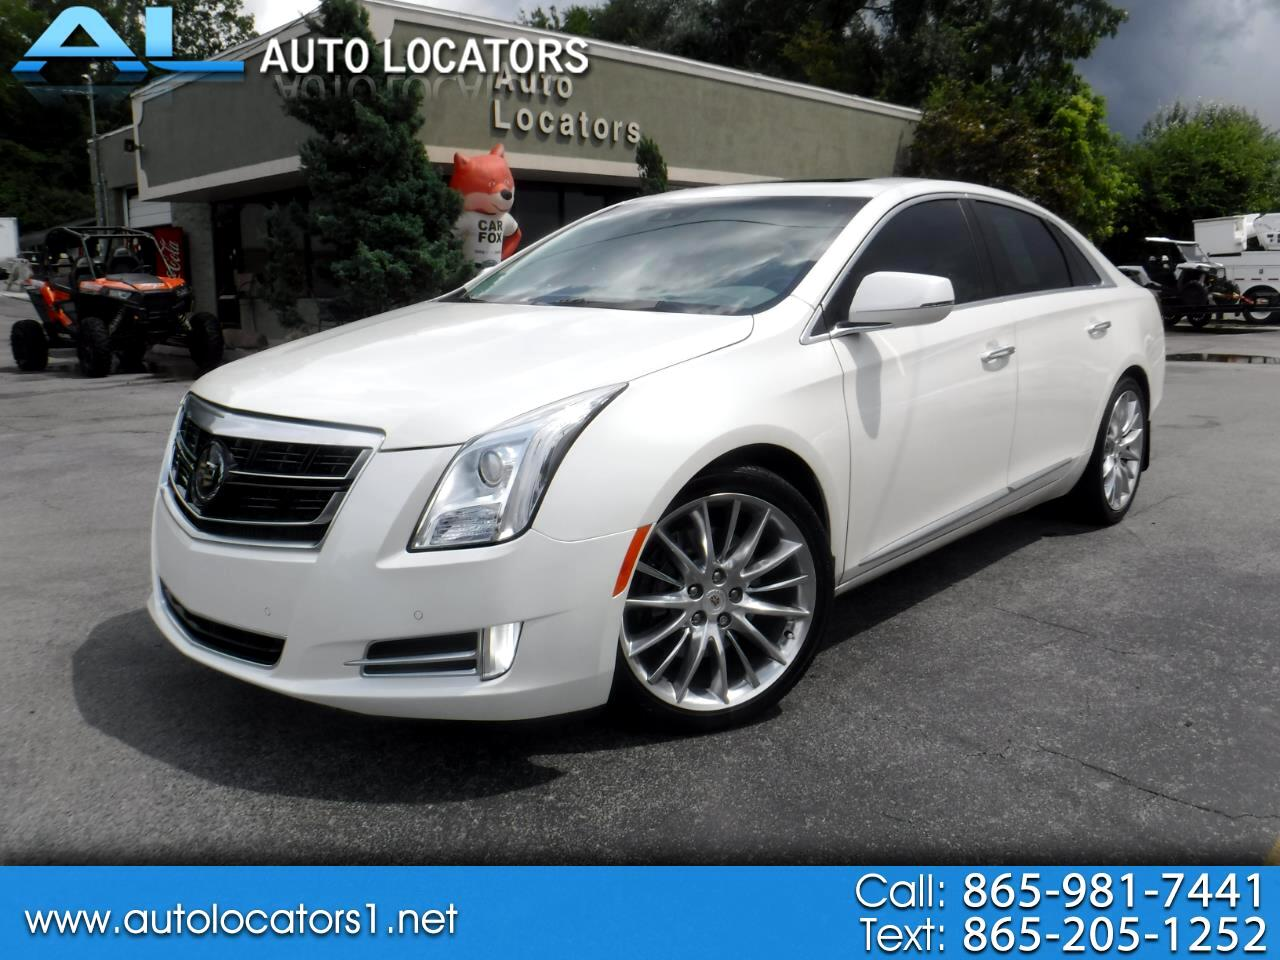 2015 Cadillac XTS 4dr Sdn Vsport Platinum AWD